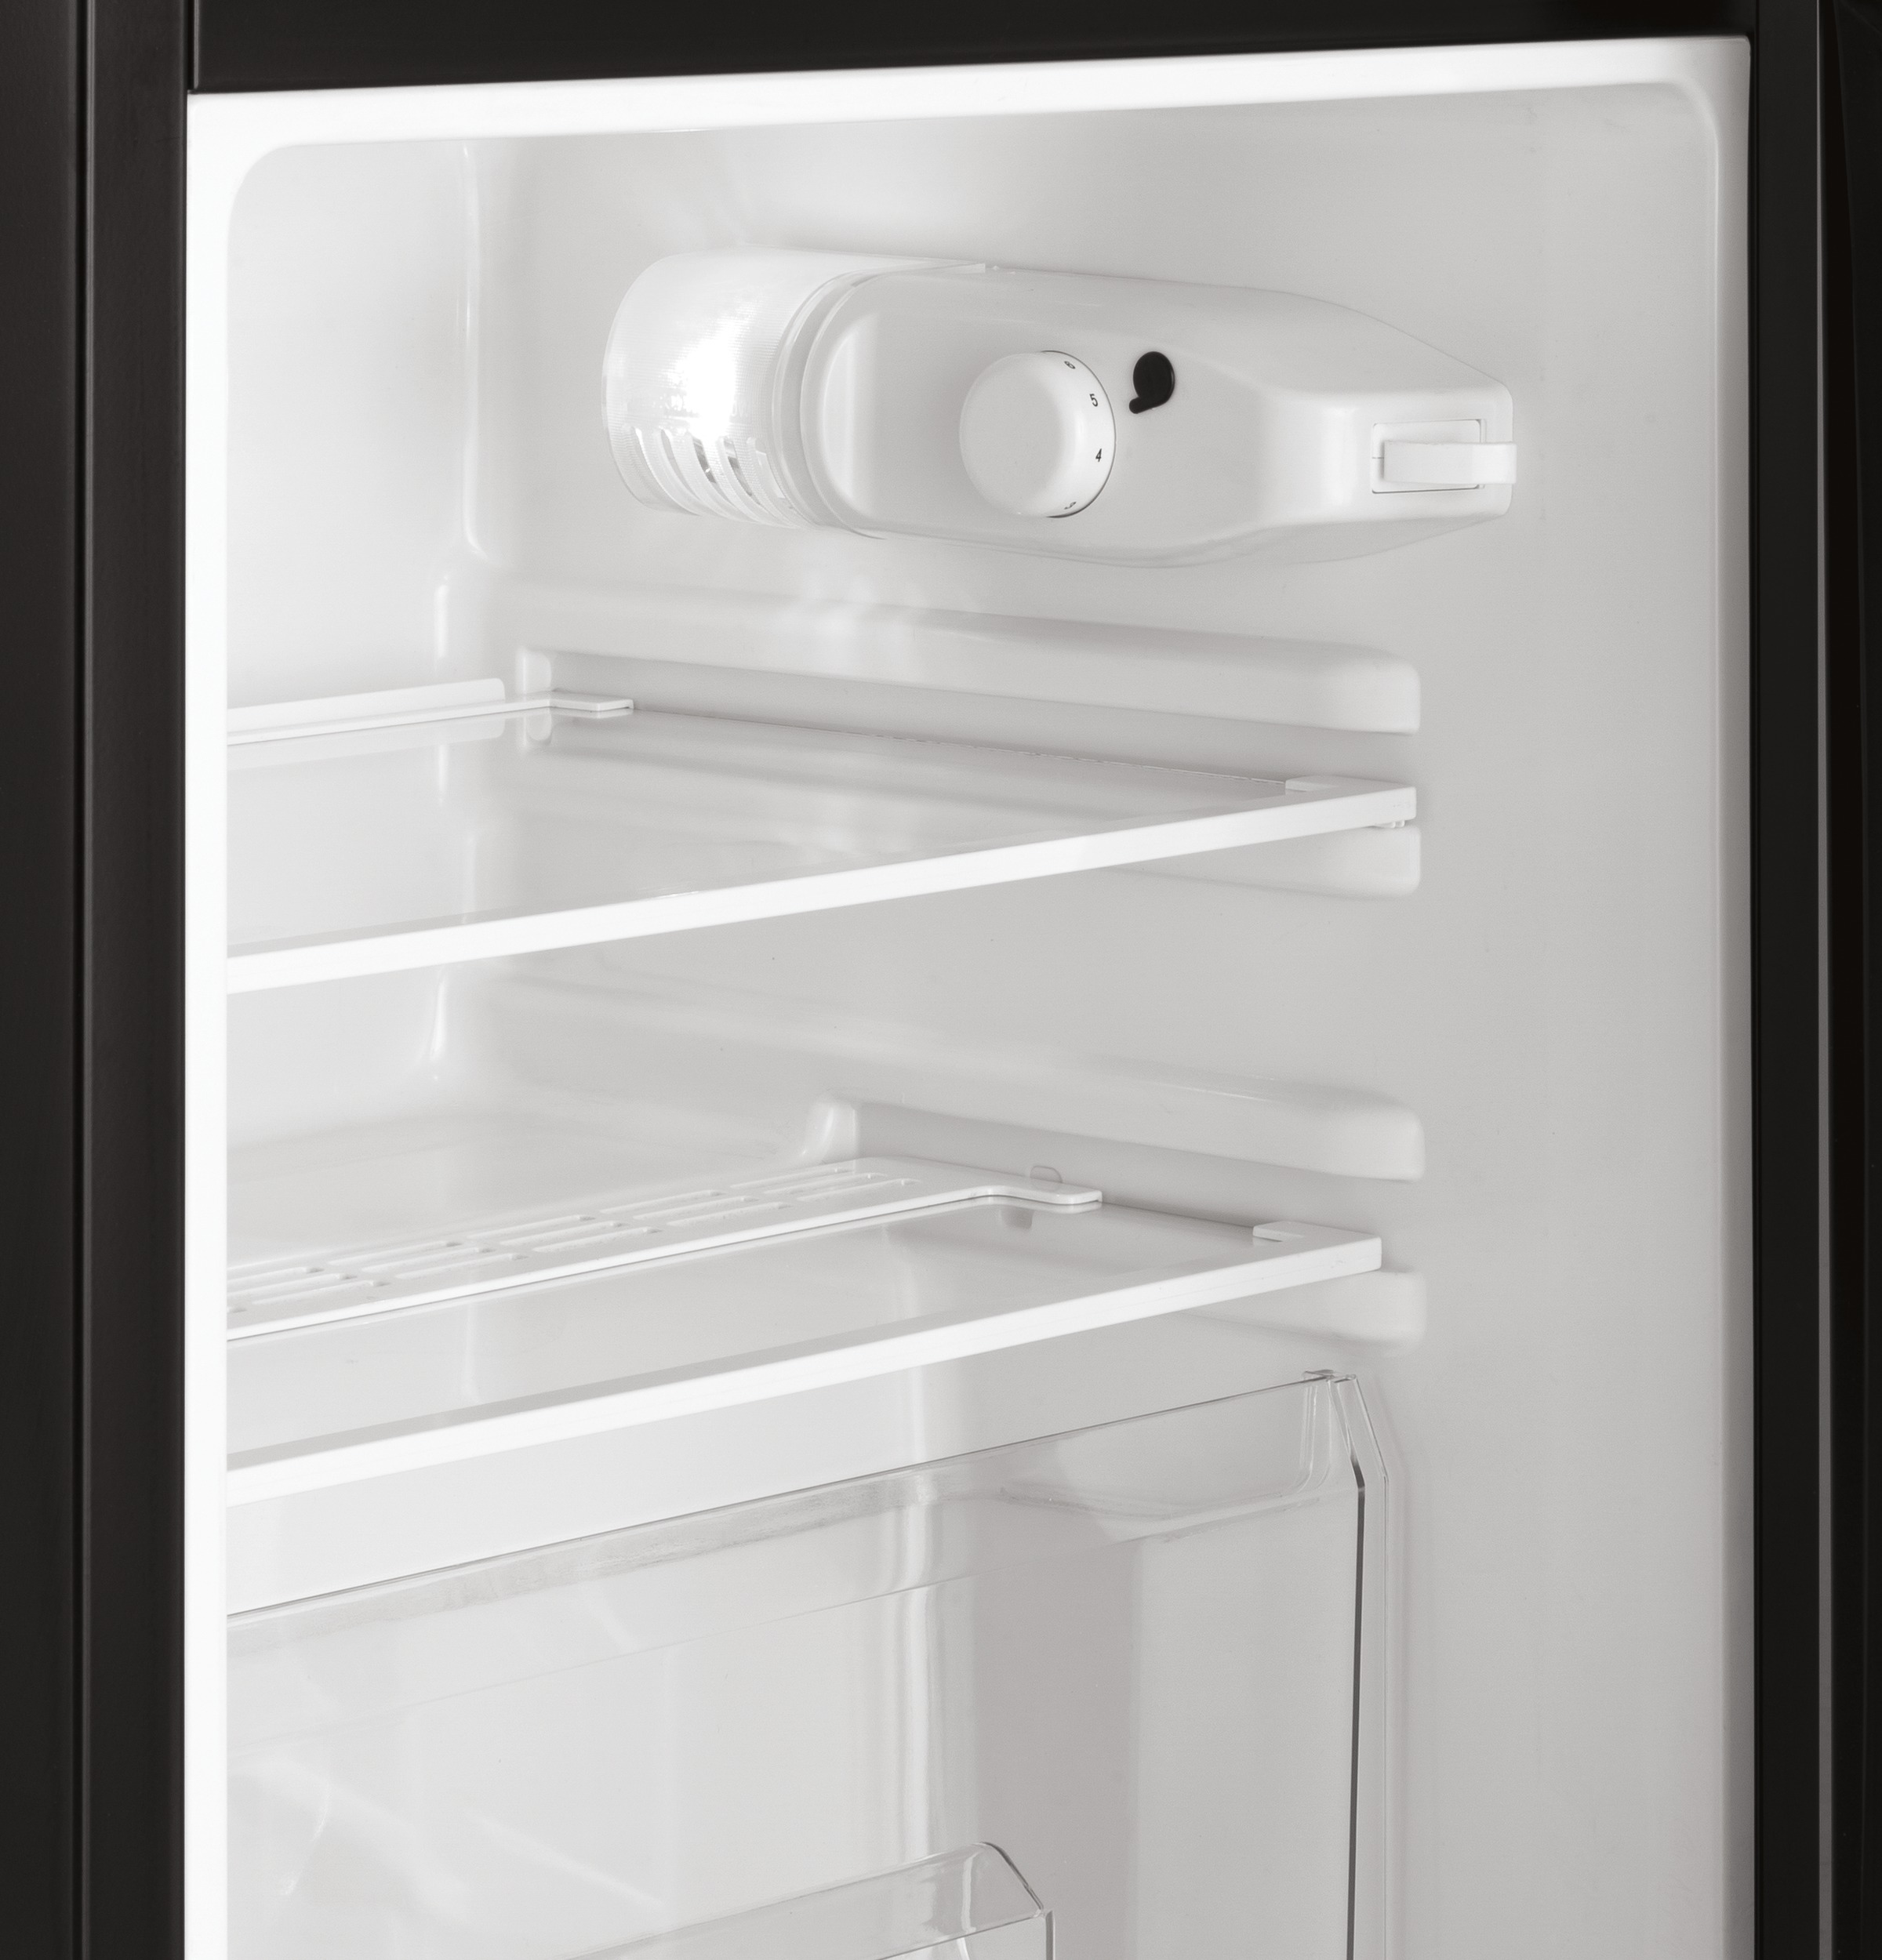 Model: HC32TW10SB | 3.2 Cu. Ft. Compact Refrigerator